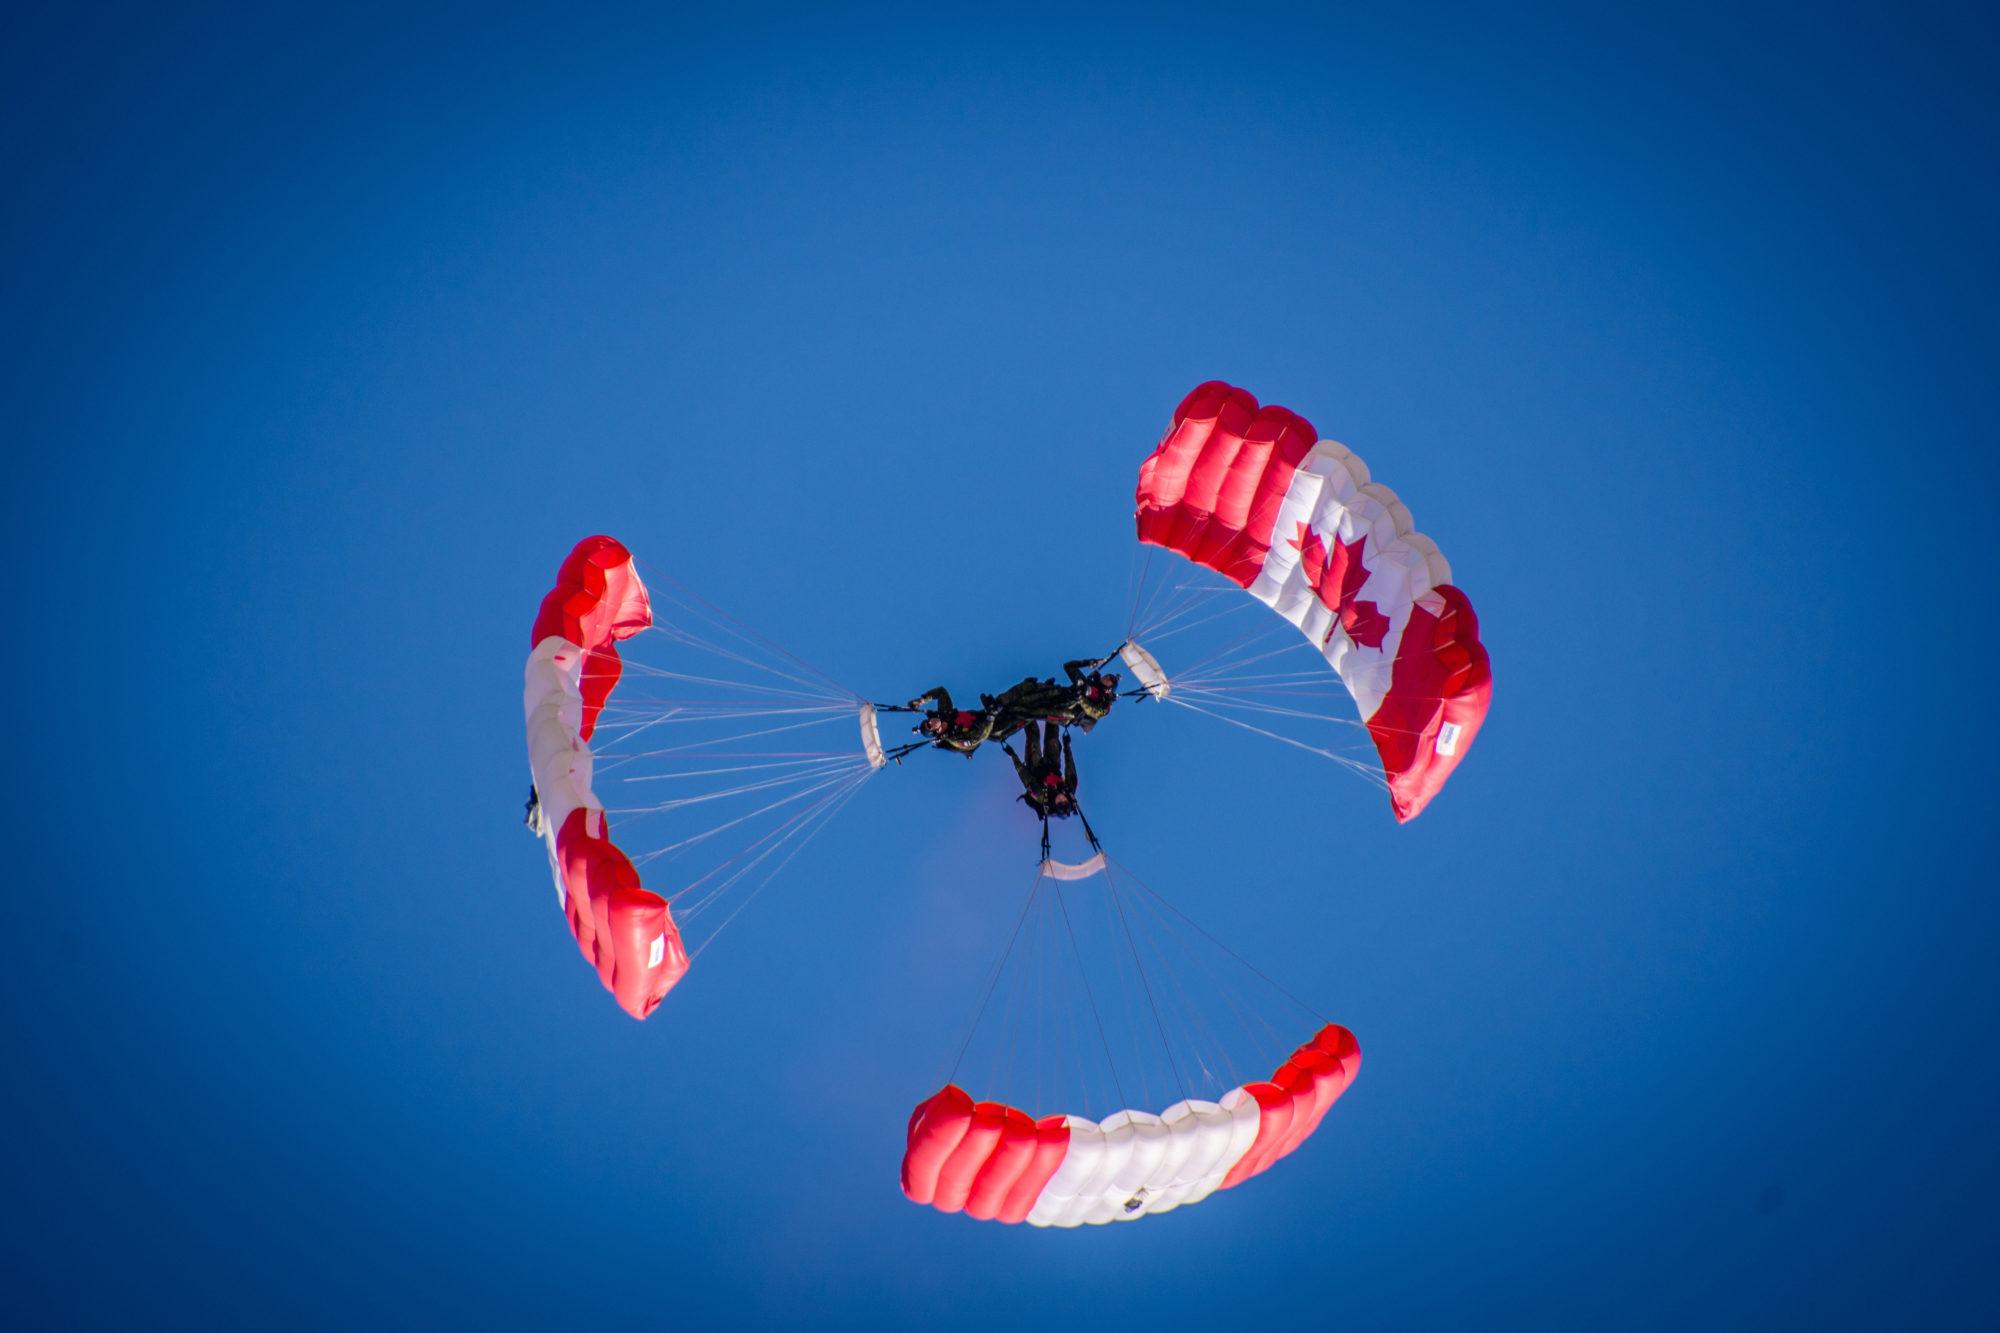 Skyhawks Parachute team